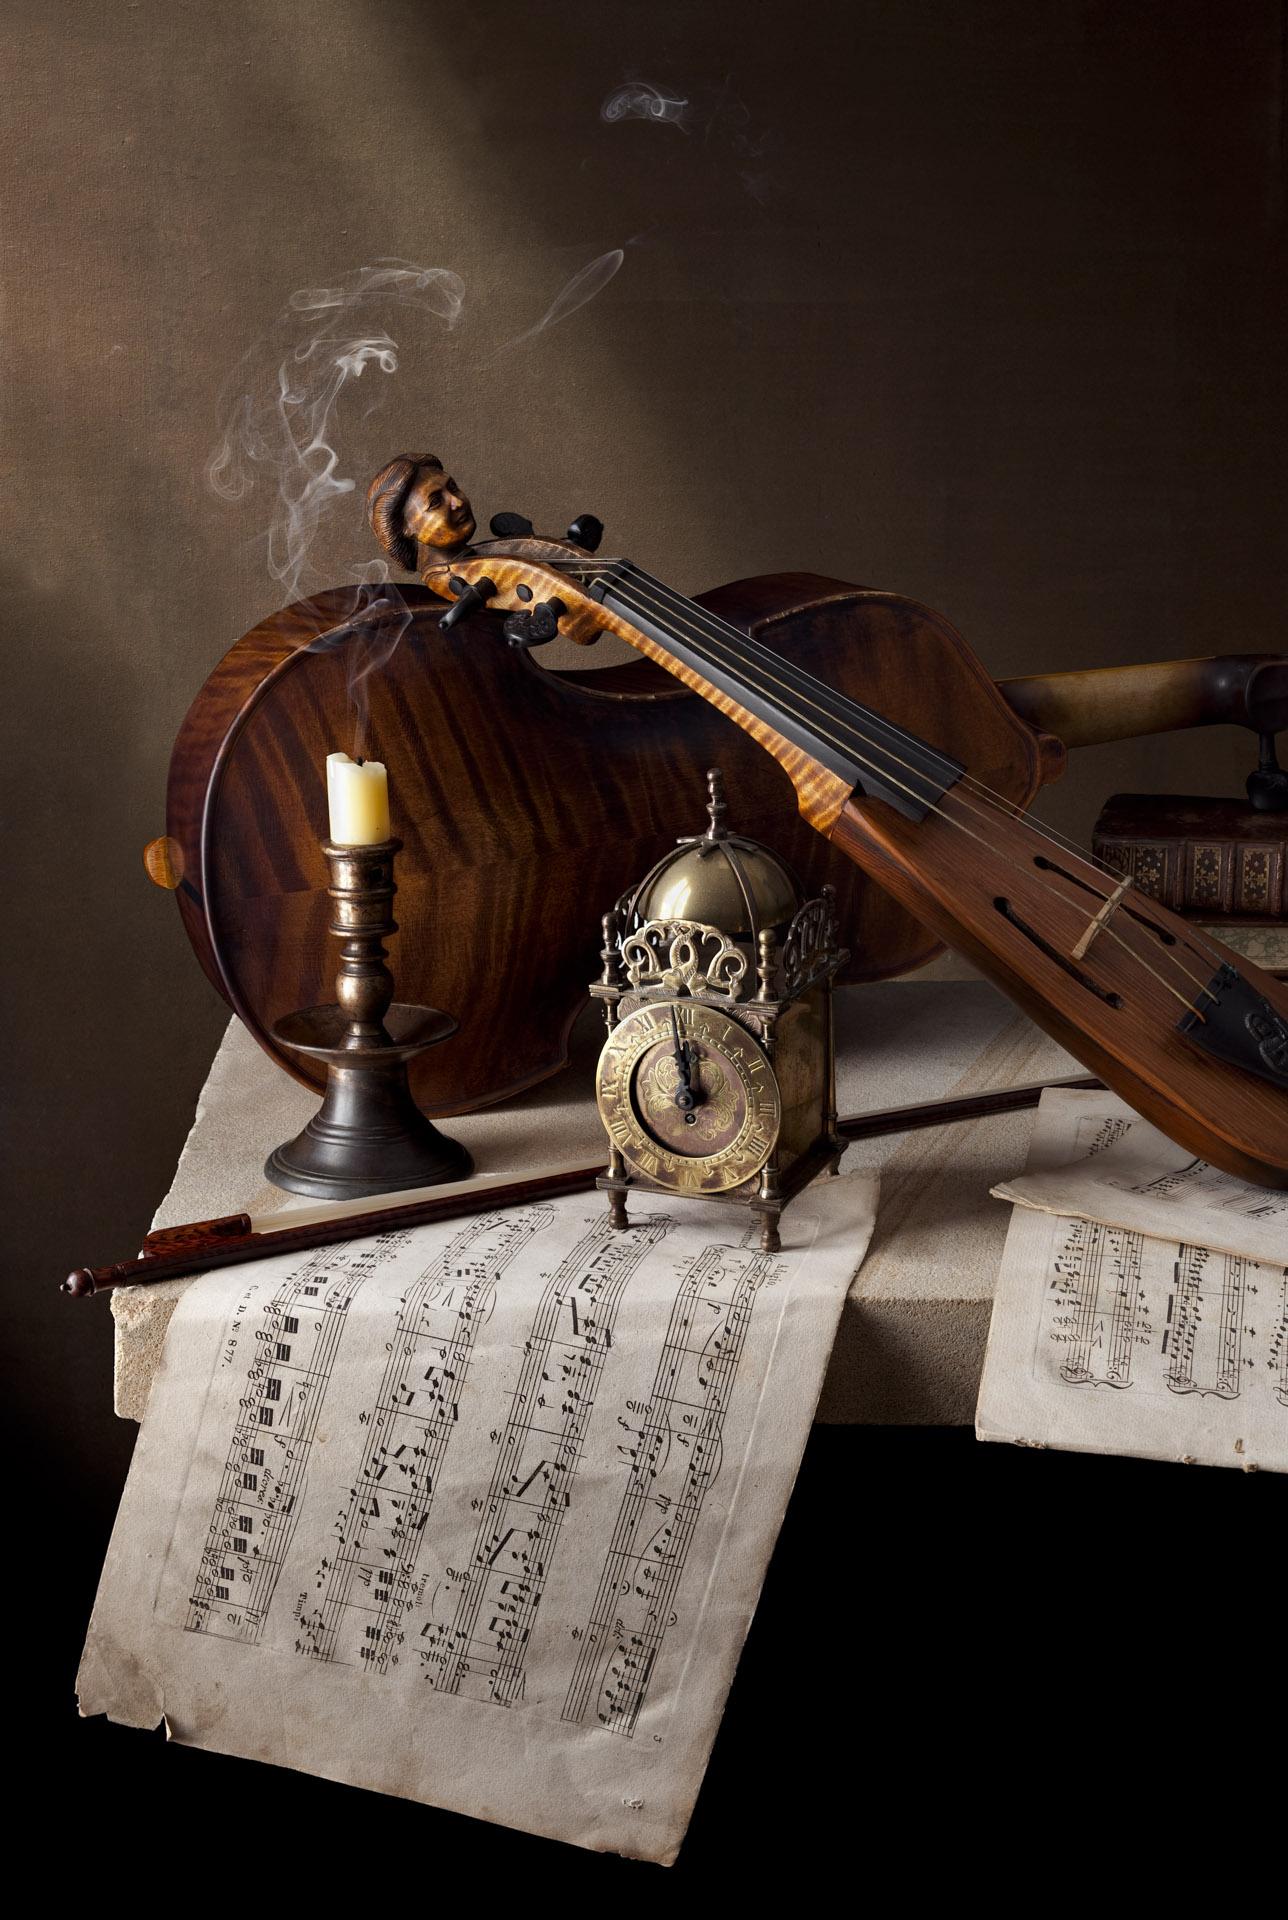 KStill life with pochette and viola